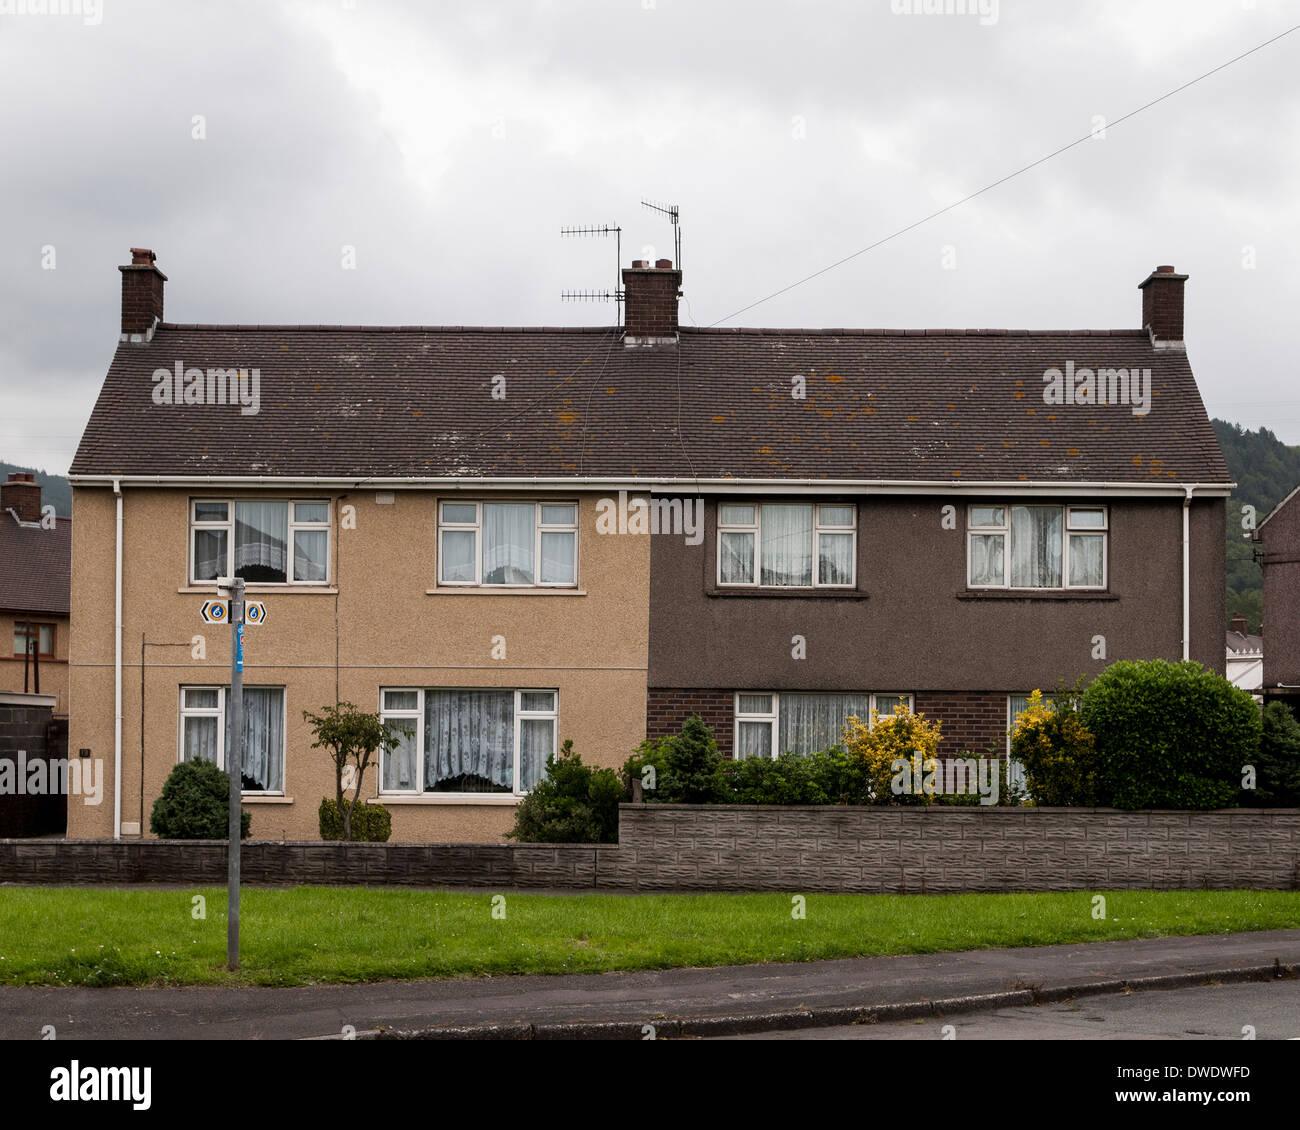 Port Talbot, Port Talbot, United Kingdom. Architect: Various, 2014. Semi-detached house. Stock Photo